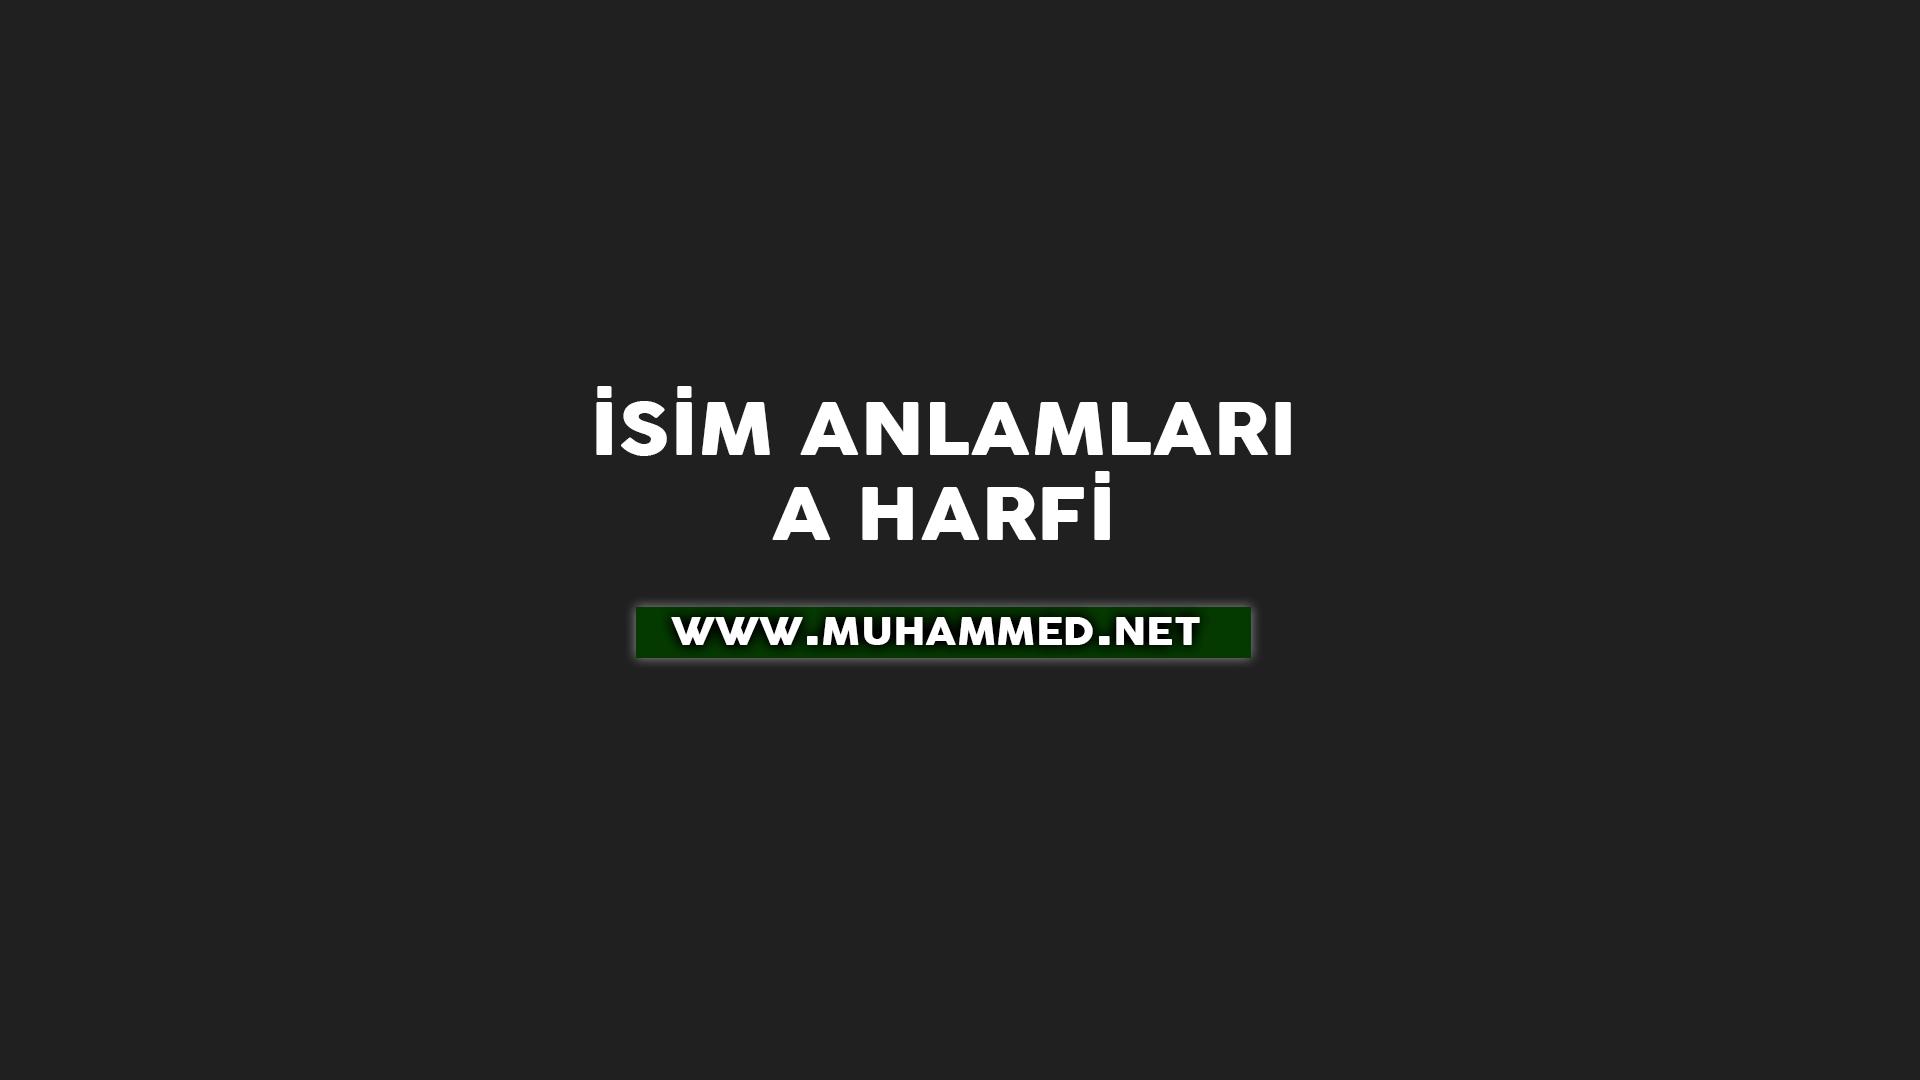 İsim Anlamları - A Harfi